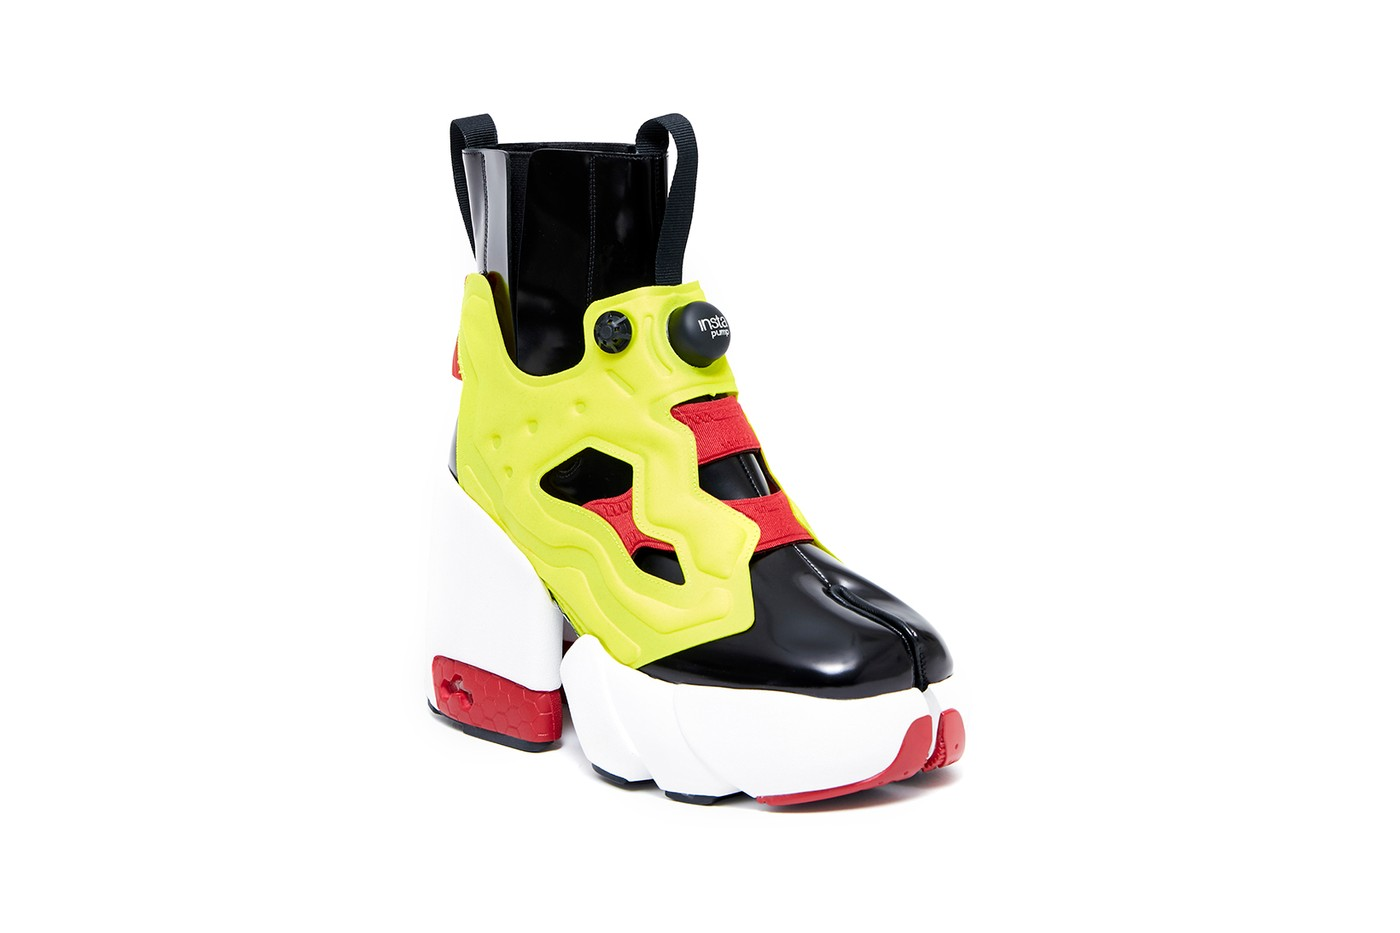 Tα πιο stylish sneakers της σεζόν έχουν την υπογραφή της Reebok και του Οίκου Maison Margiela